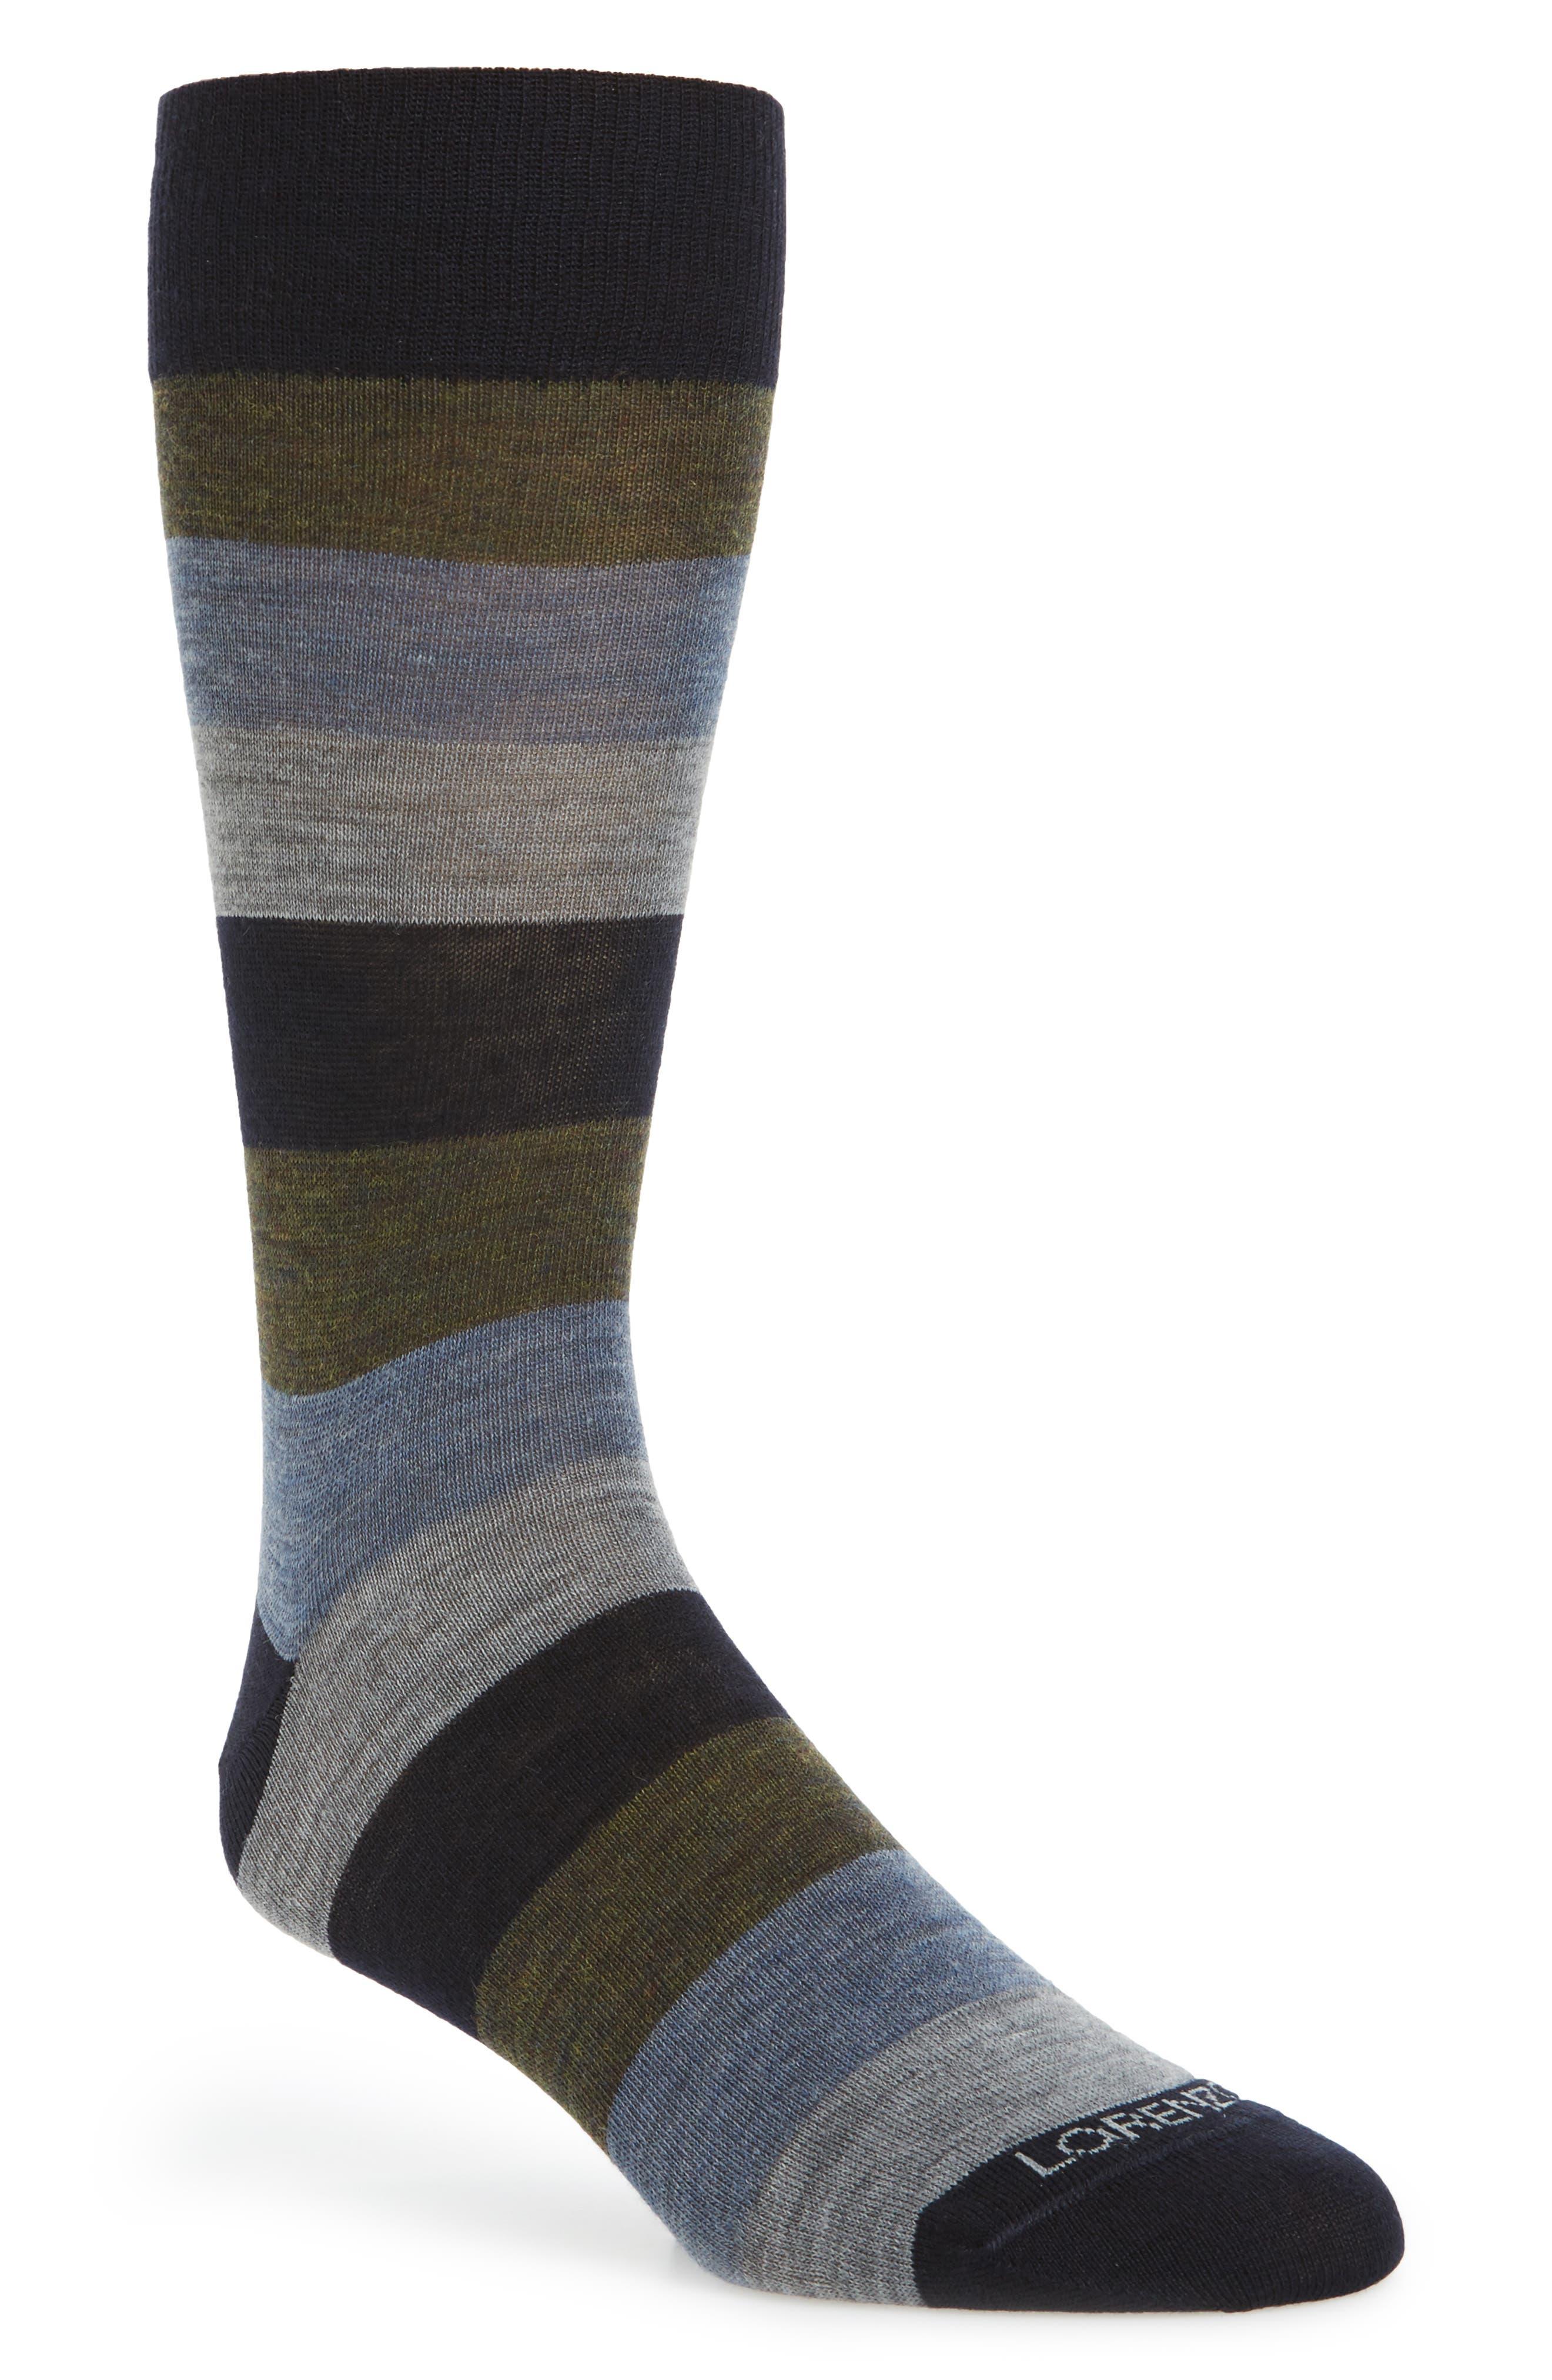 Colorblock Socks,                         Main,                         color, Navy